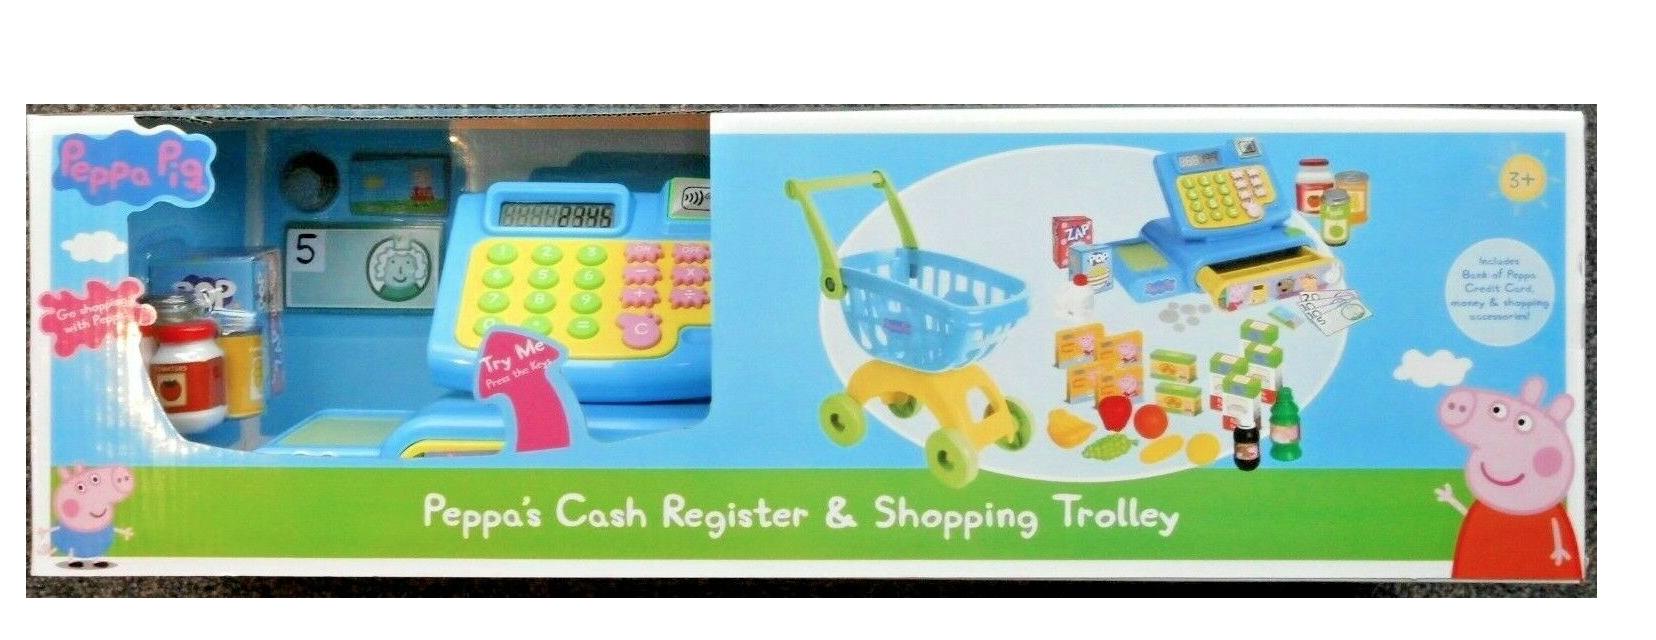 Peppa's cash register and shopping trolley £17 @ Tesco - Batley